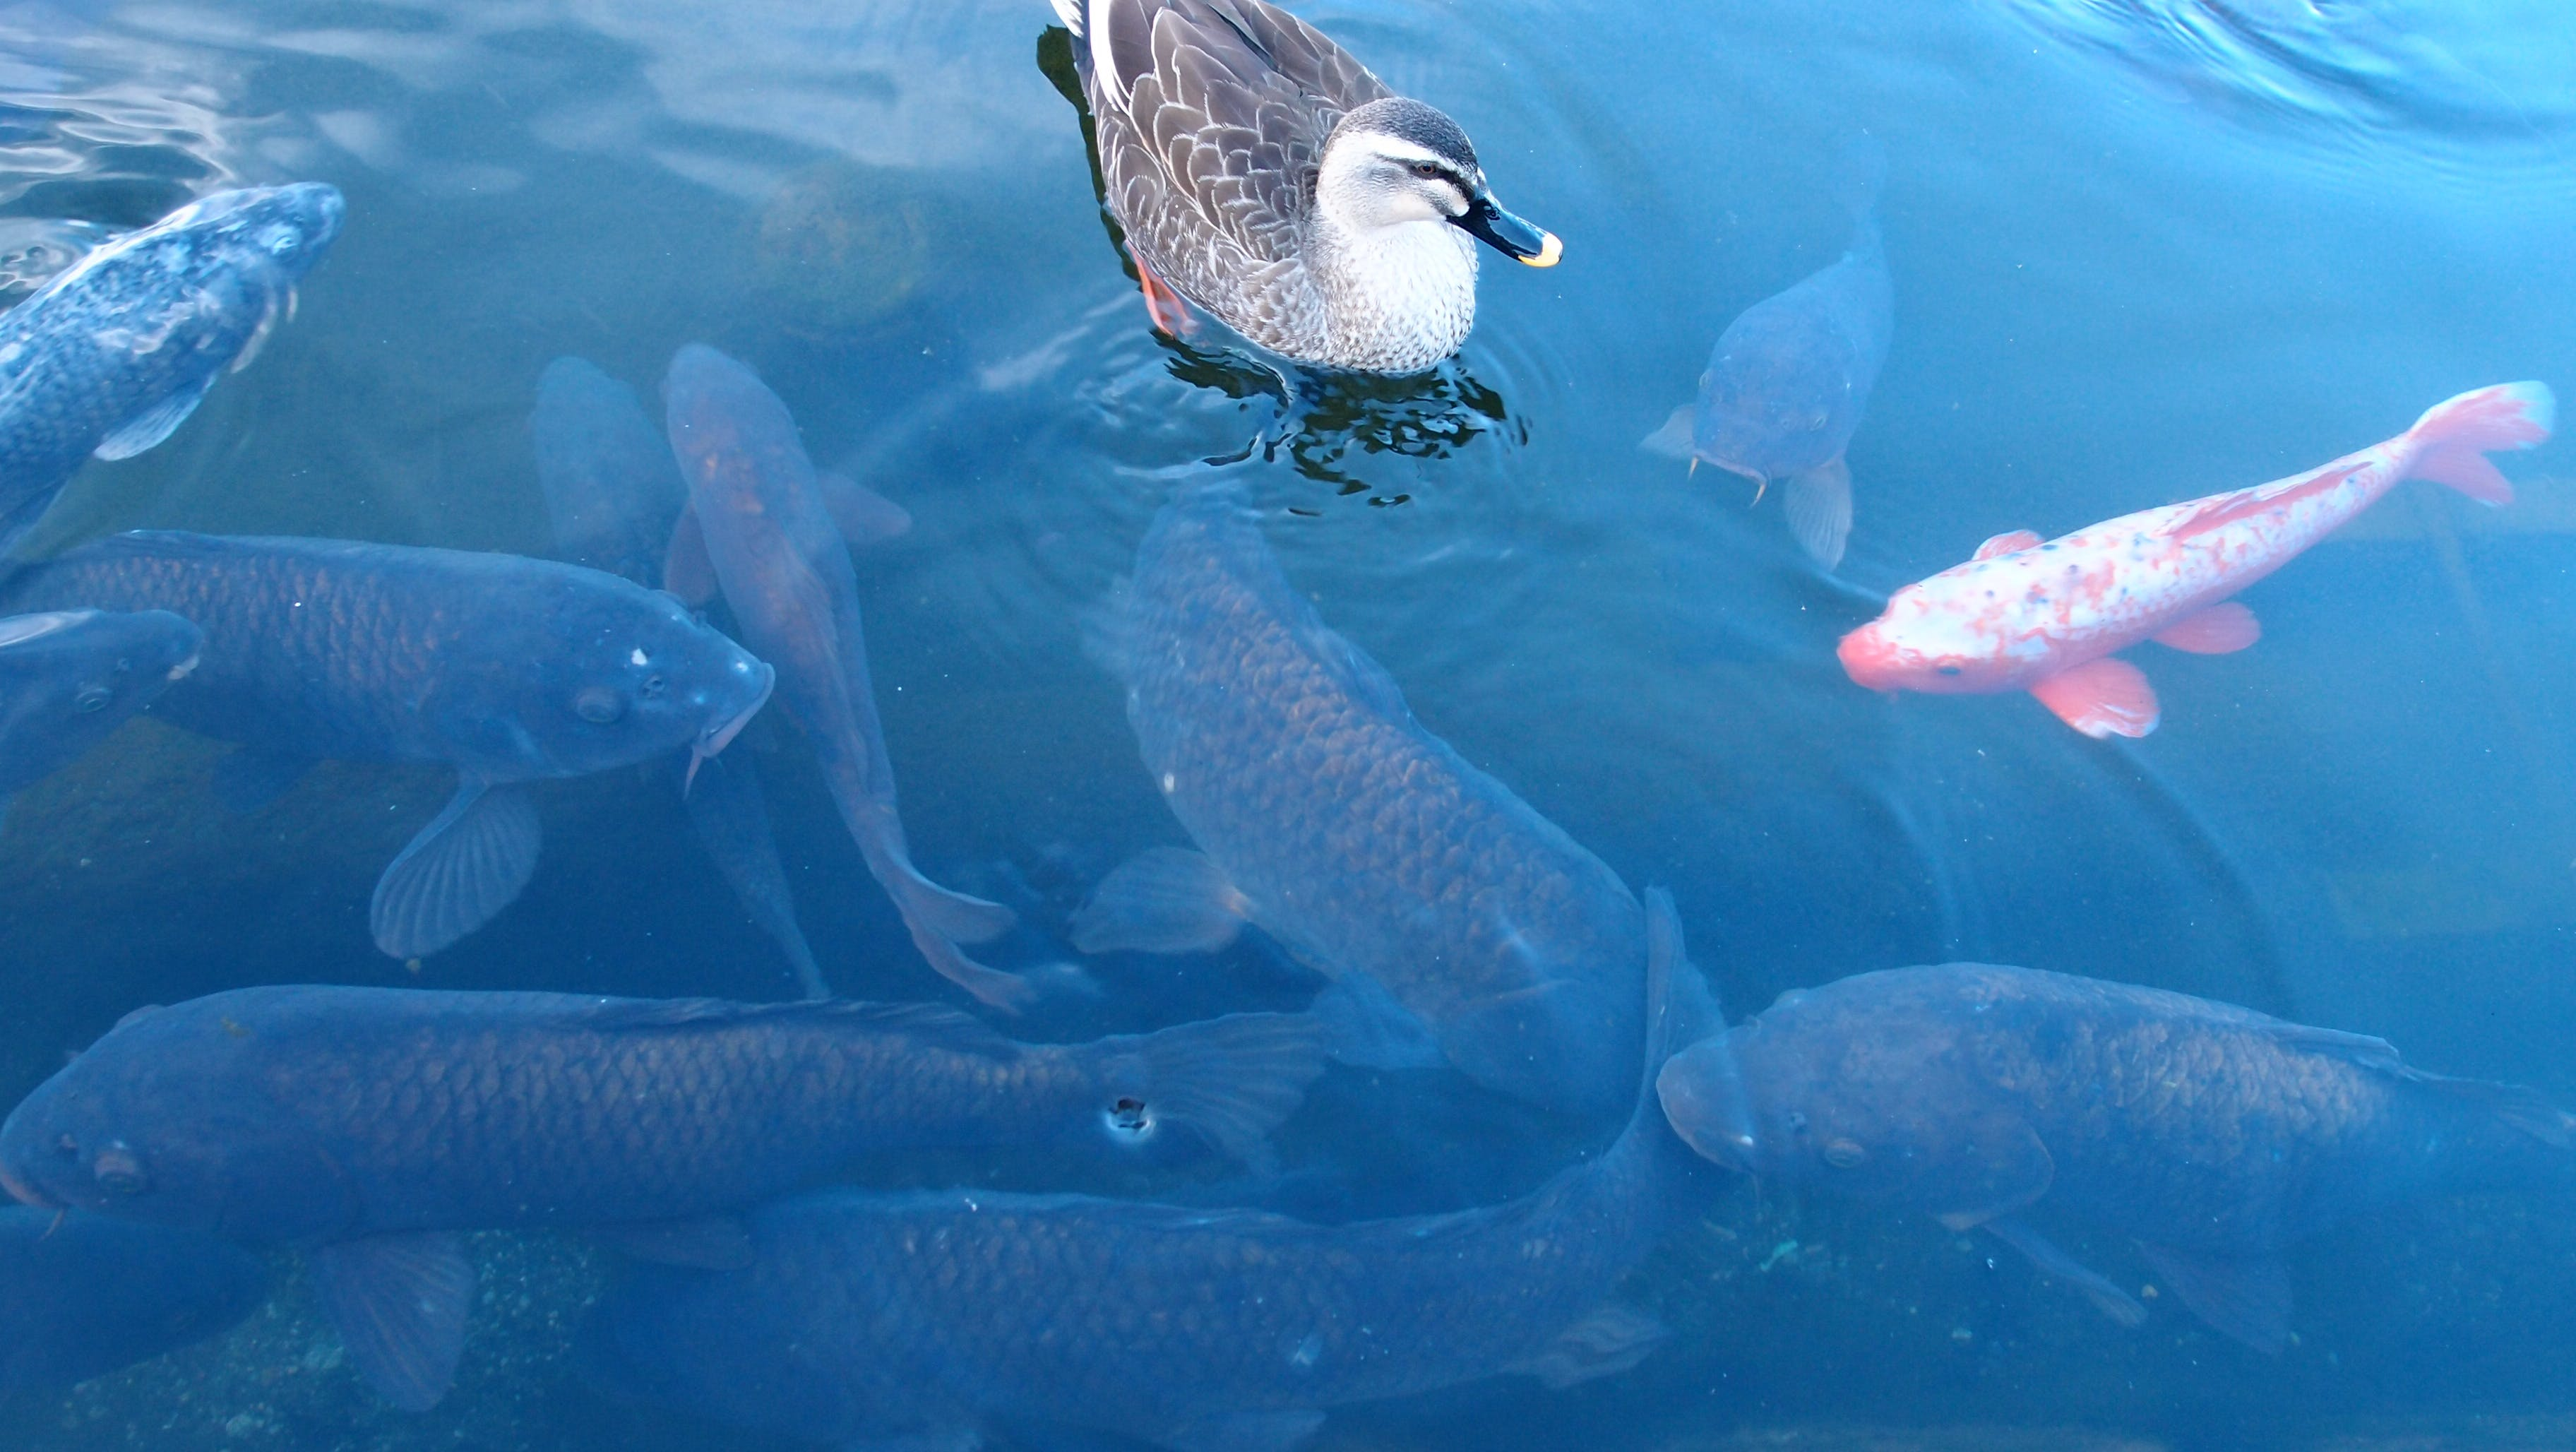 Free stock photo of animal, animals, blue, duck